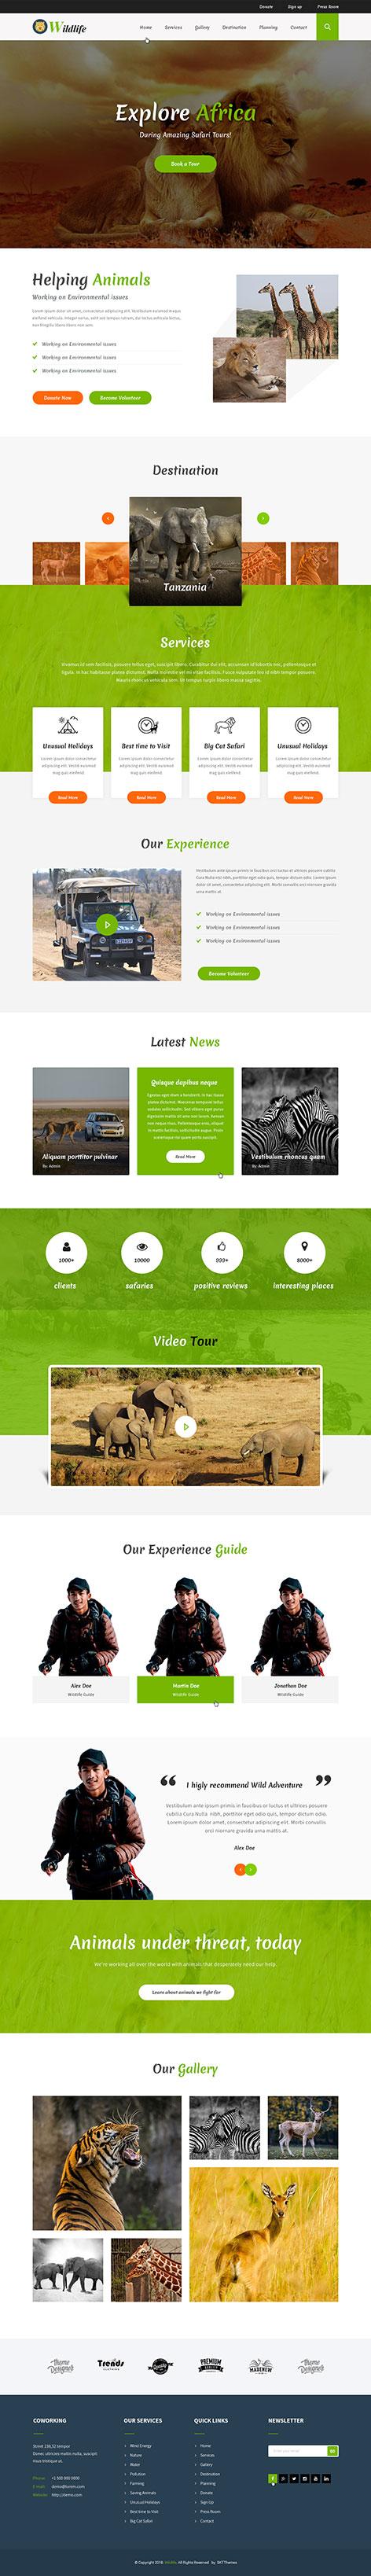 zoo wordpress theme2 - WildLife